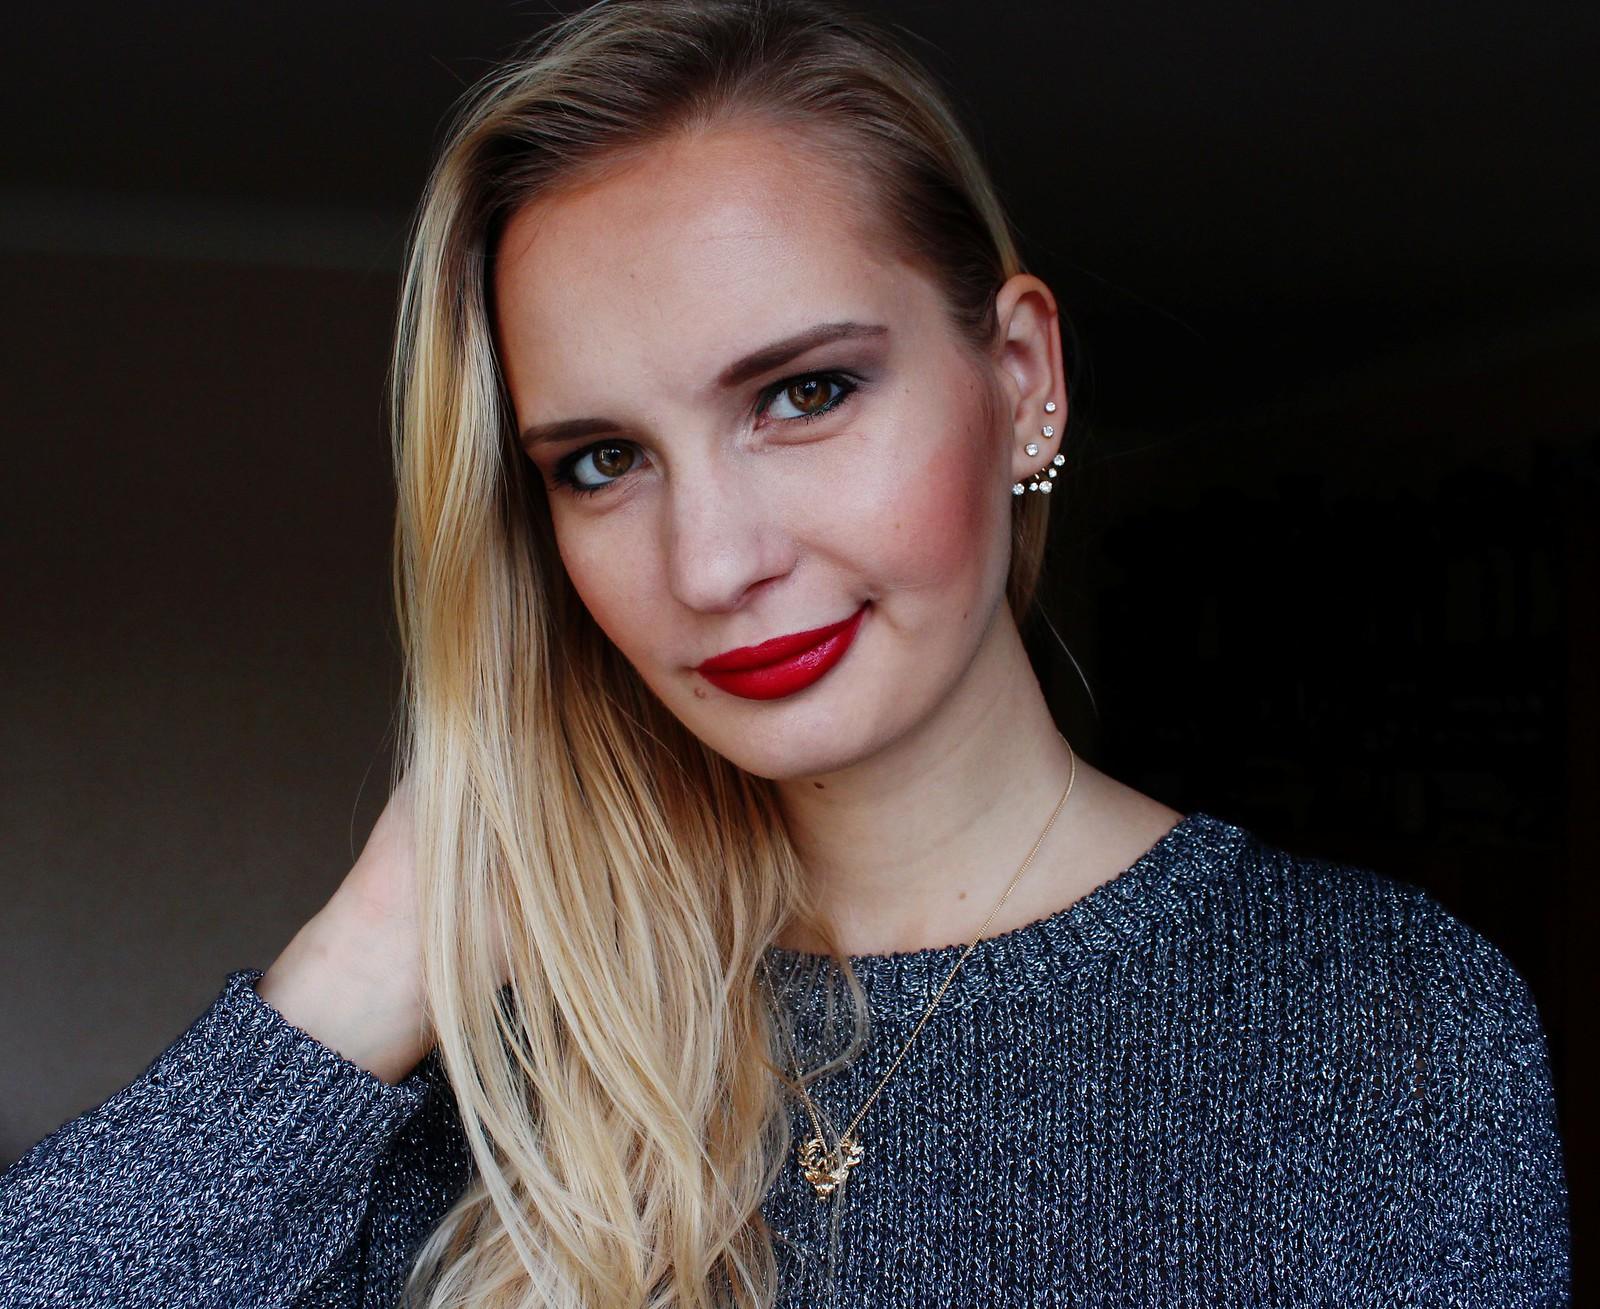 Festive makeup inspiration